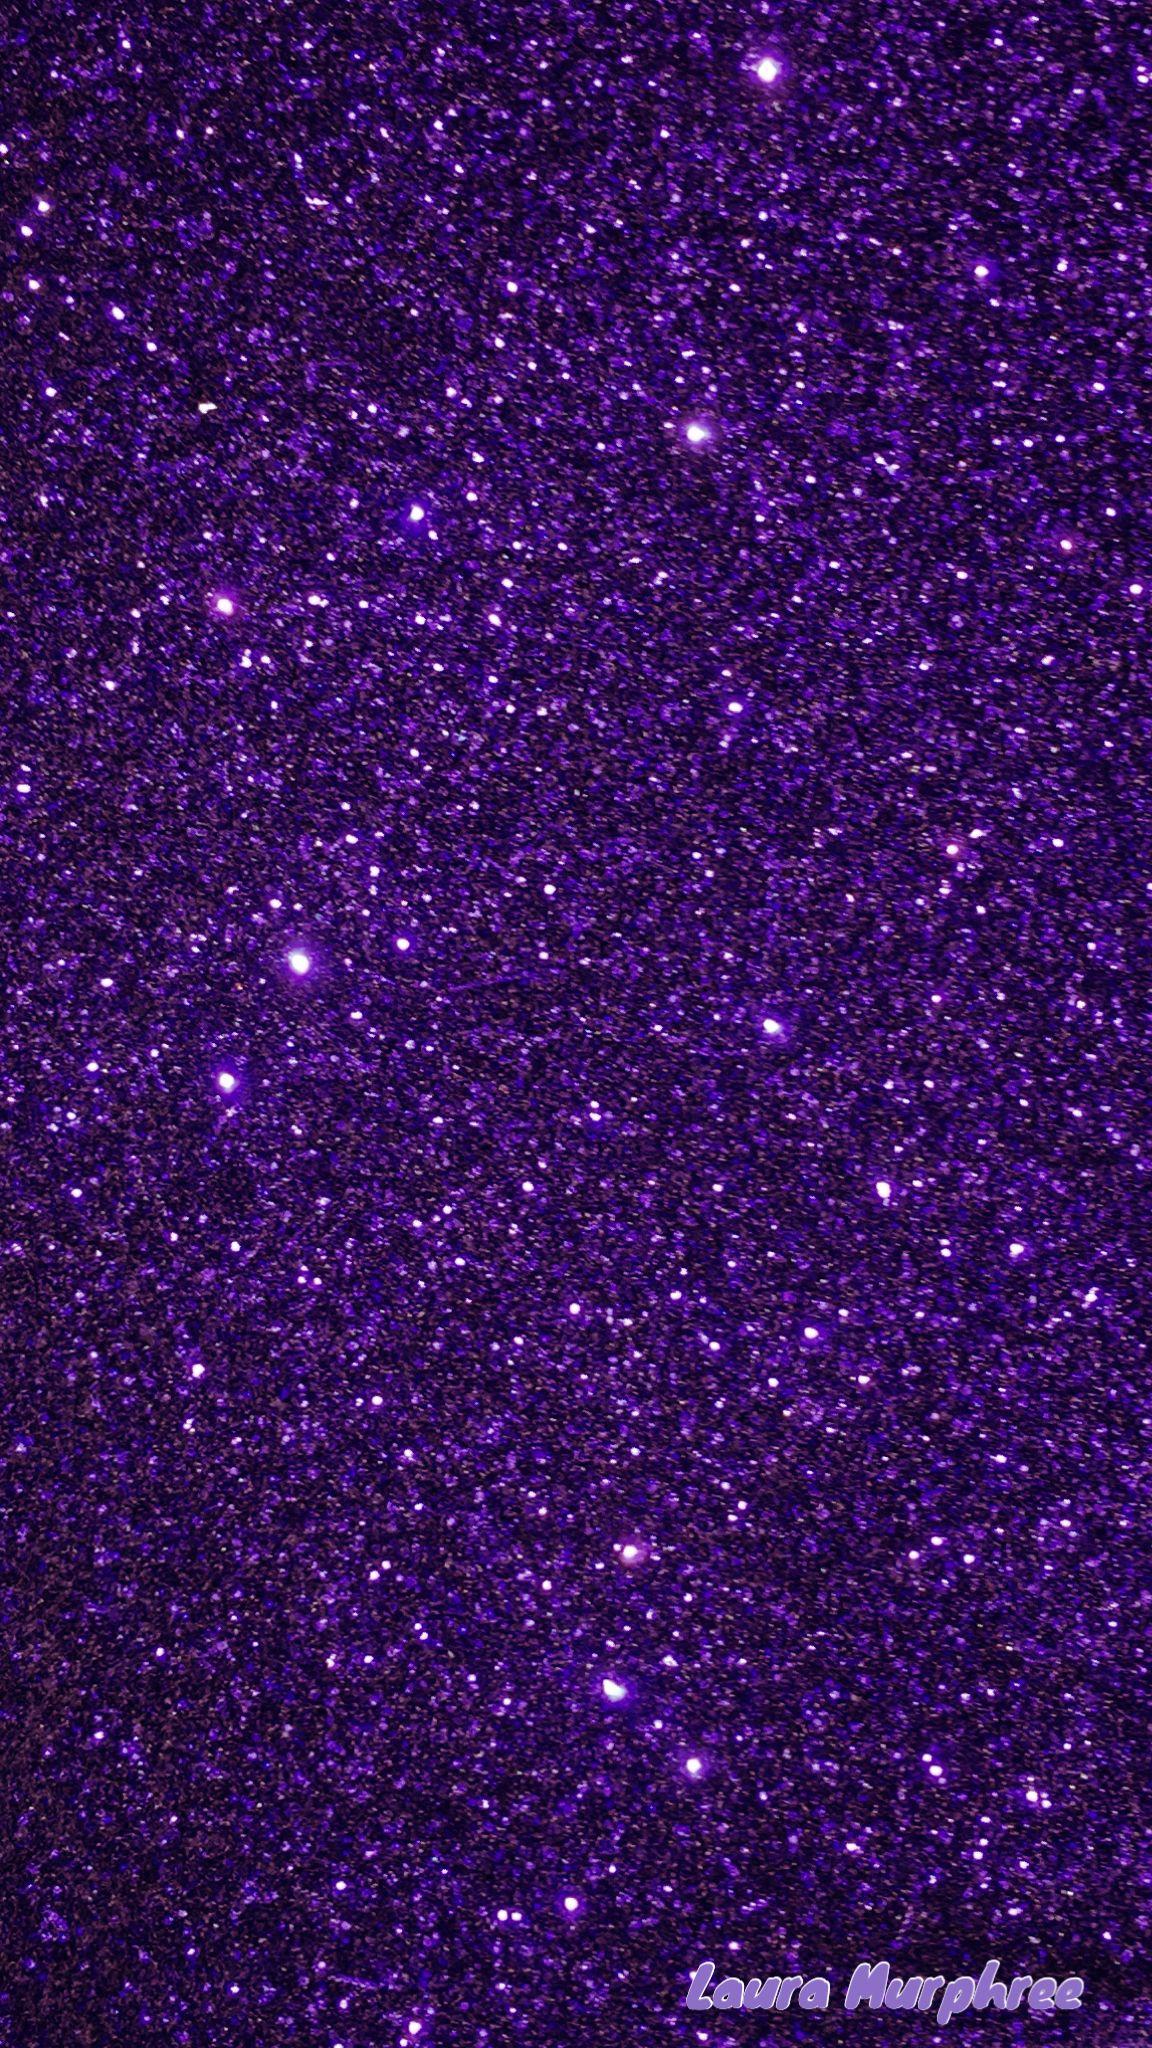 Glitter Phone Wallpaper Purple Sparkle Background Glittery Sparkling Girly Pretty Glitter Phone Wallpaper Sparkles Background Glitter Wallpaper